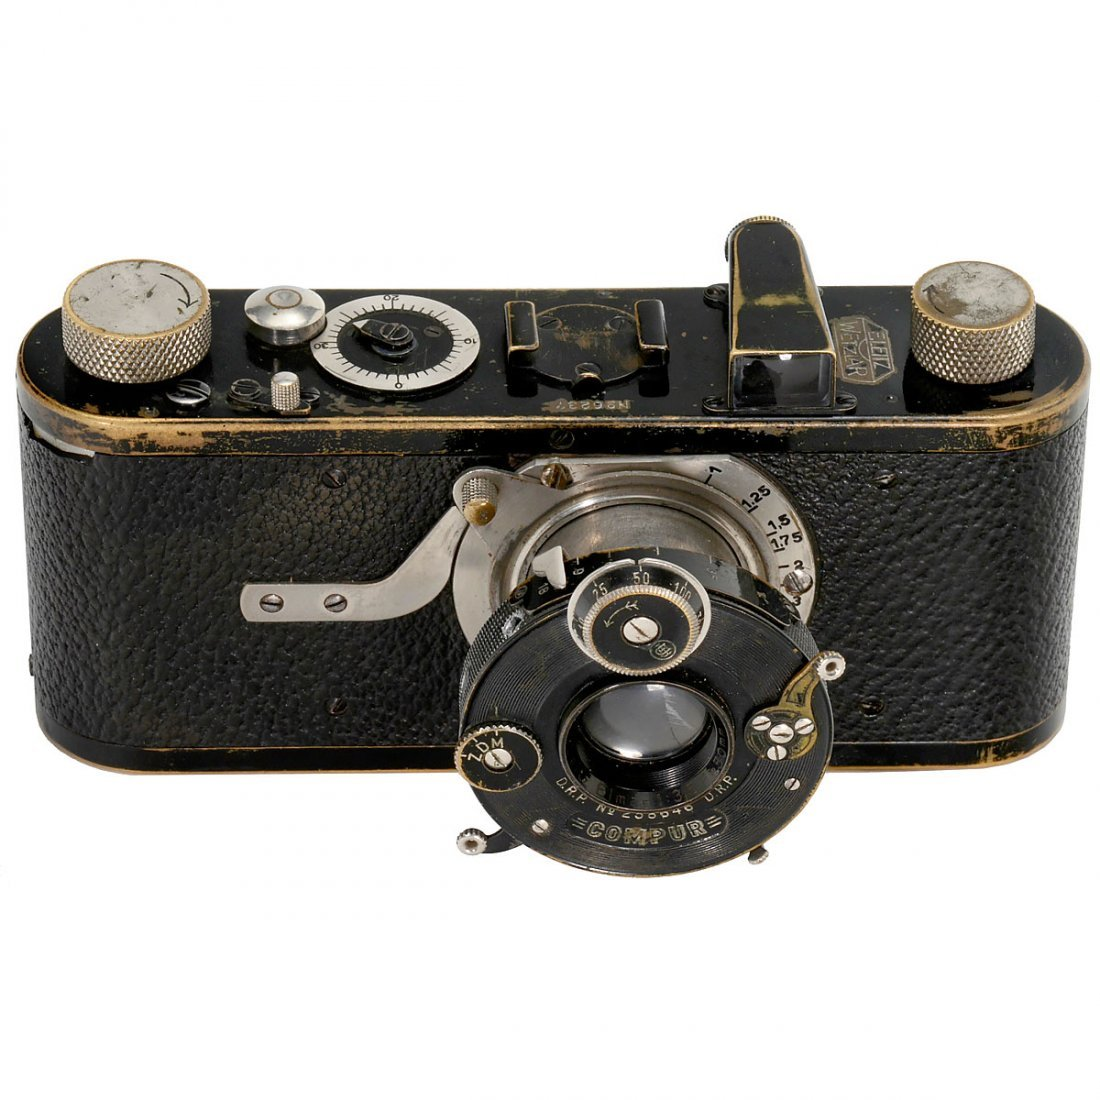 Leica with Dial-Set Compur Shutter, 1931 - 2